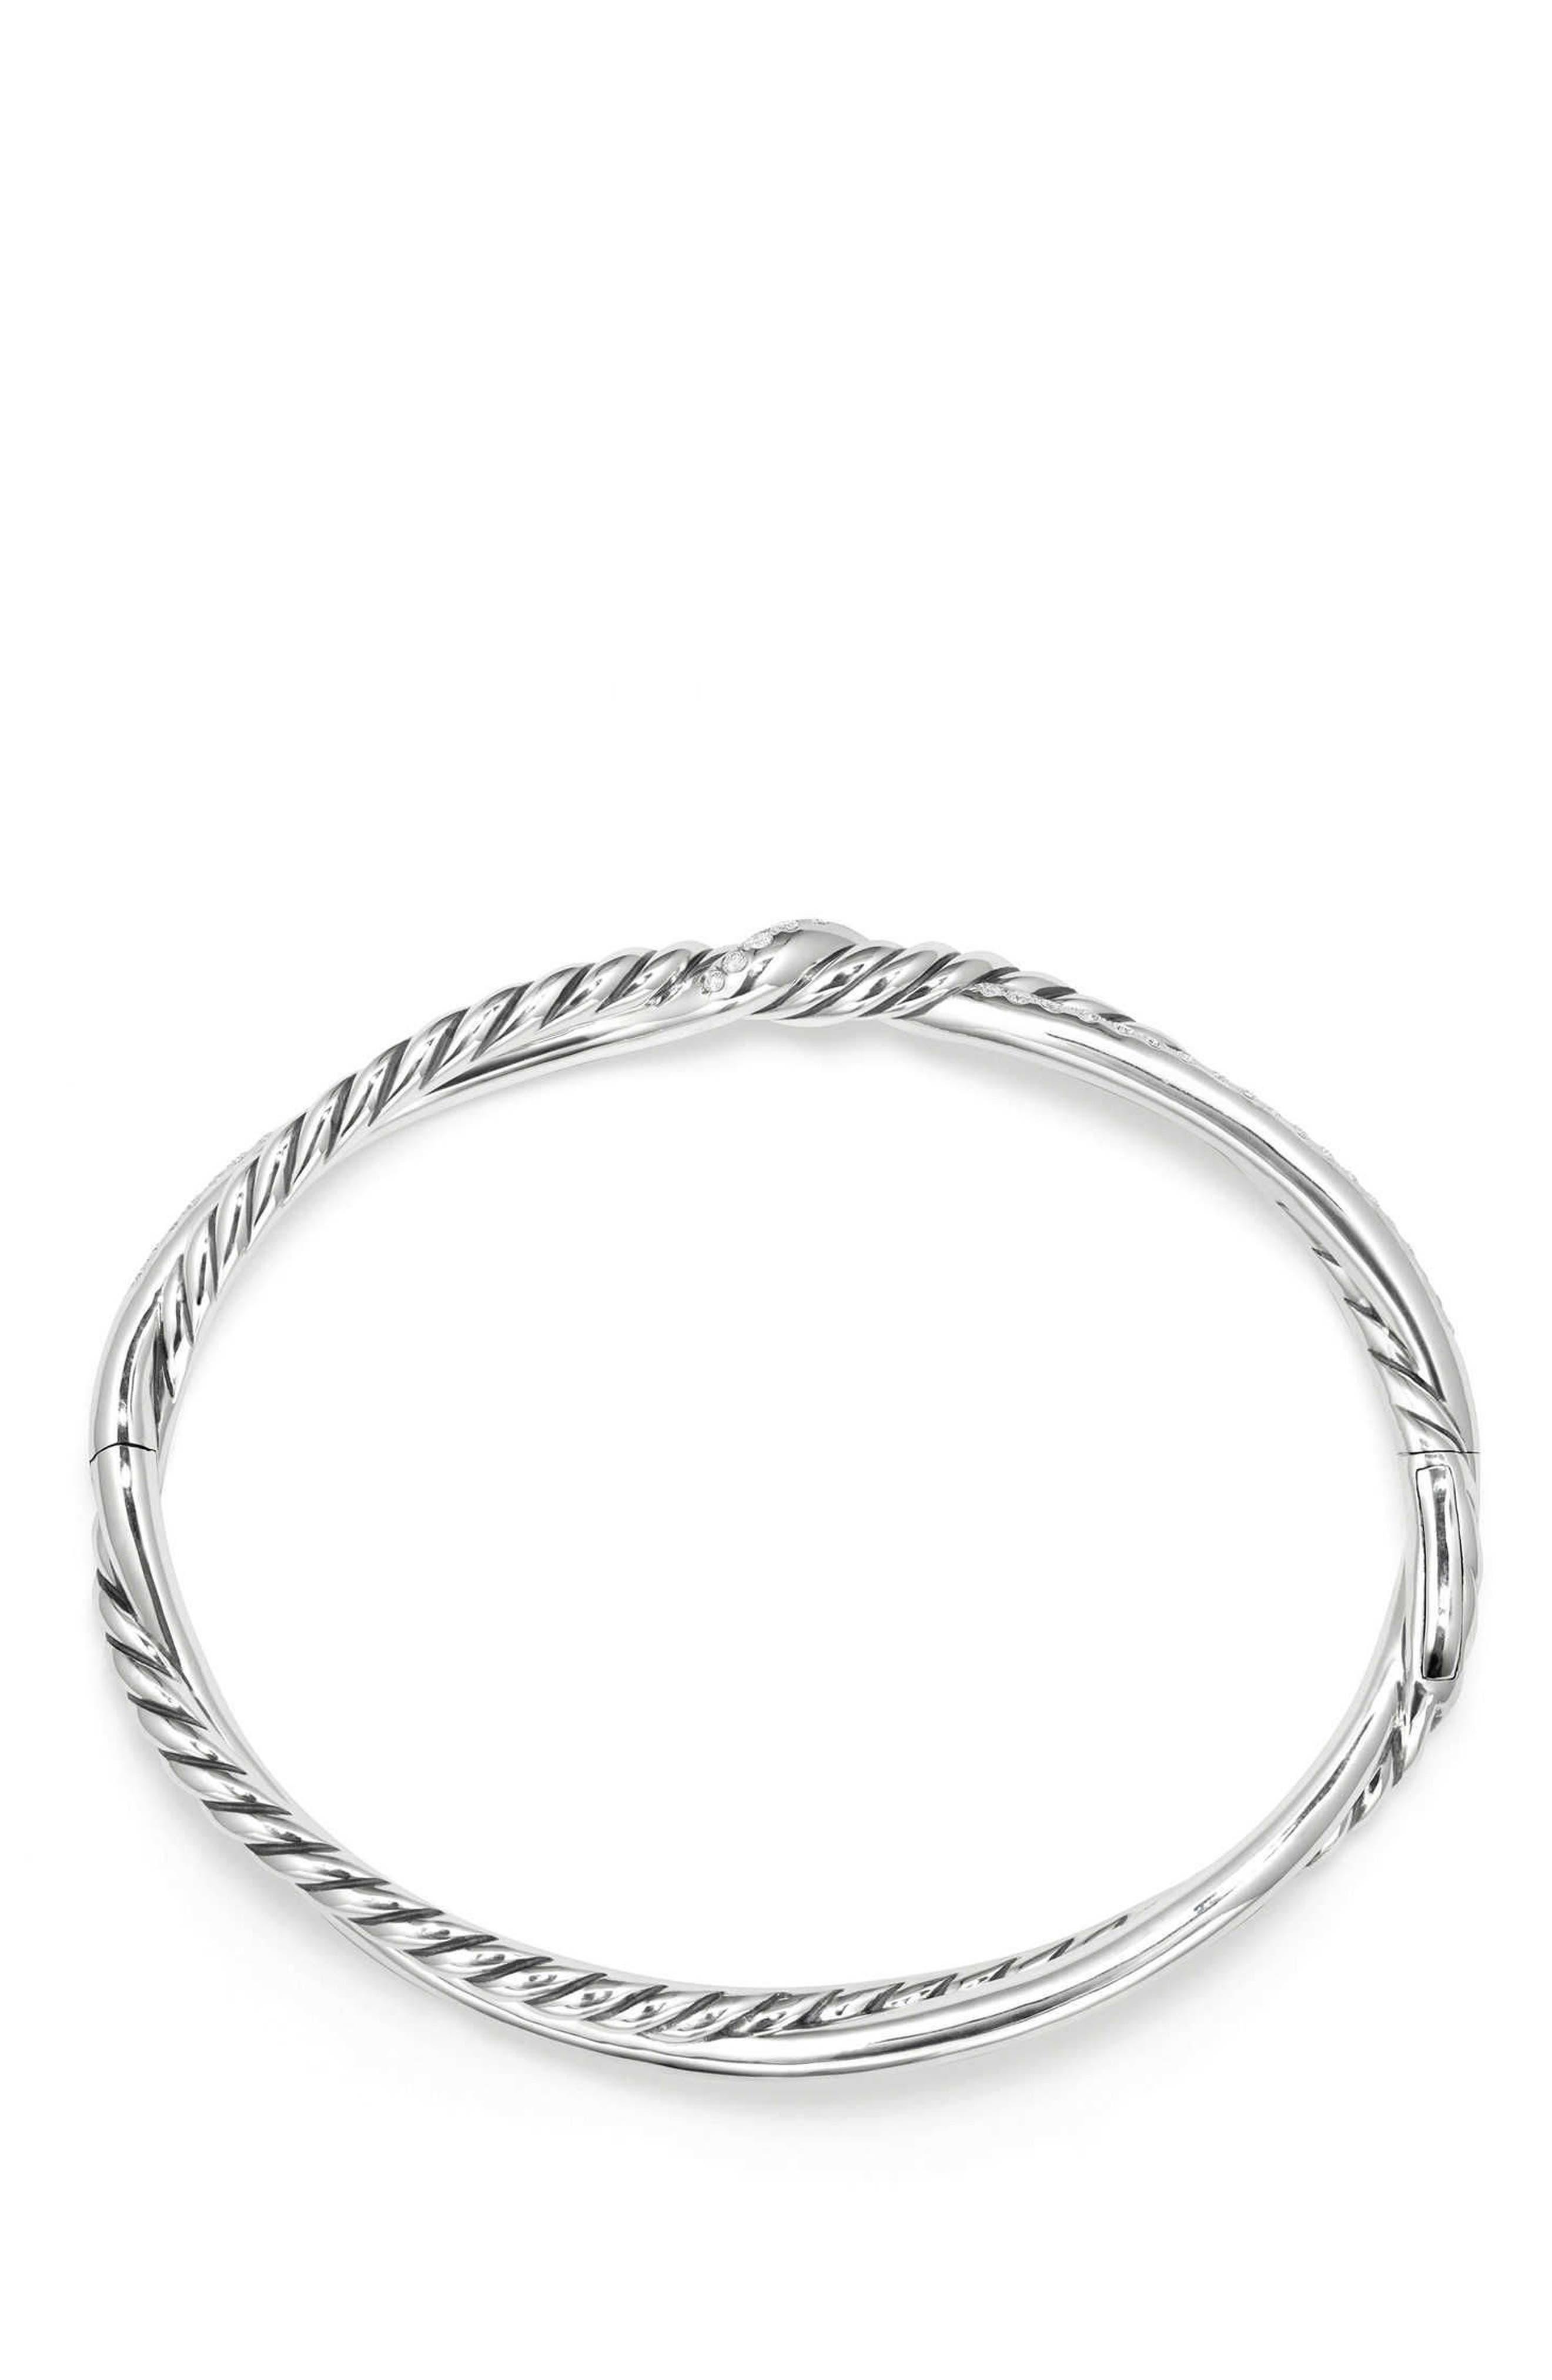 Continuance Full Pavé Bracelet with Diamonds,                             Main thumbnail 1, color,                             SILVER/ DIAMOND